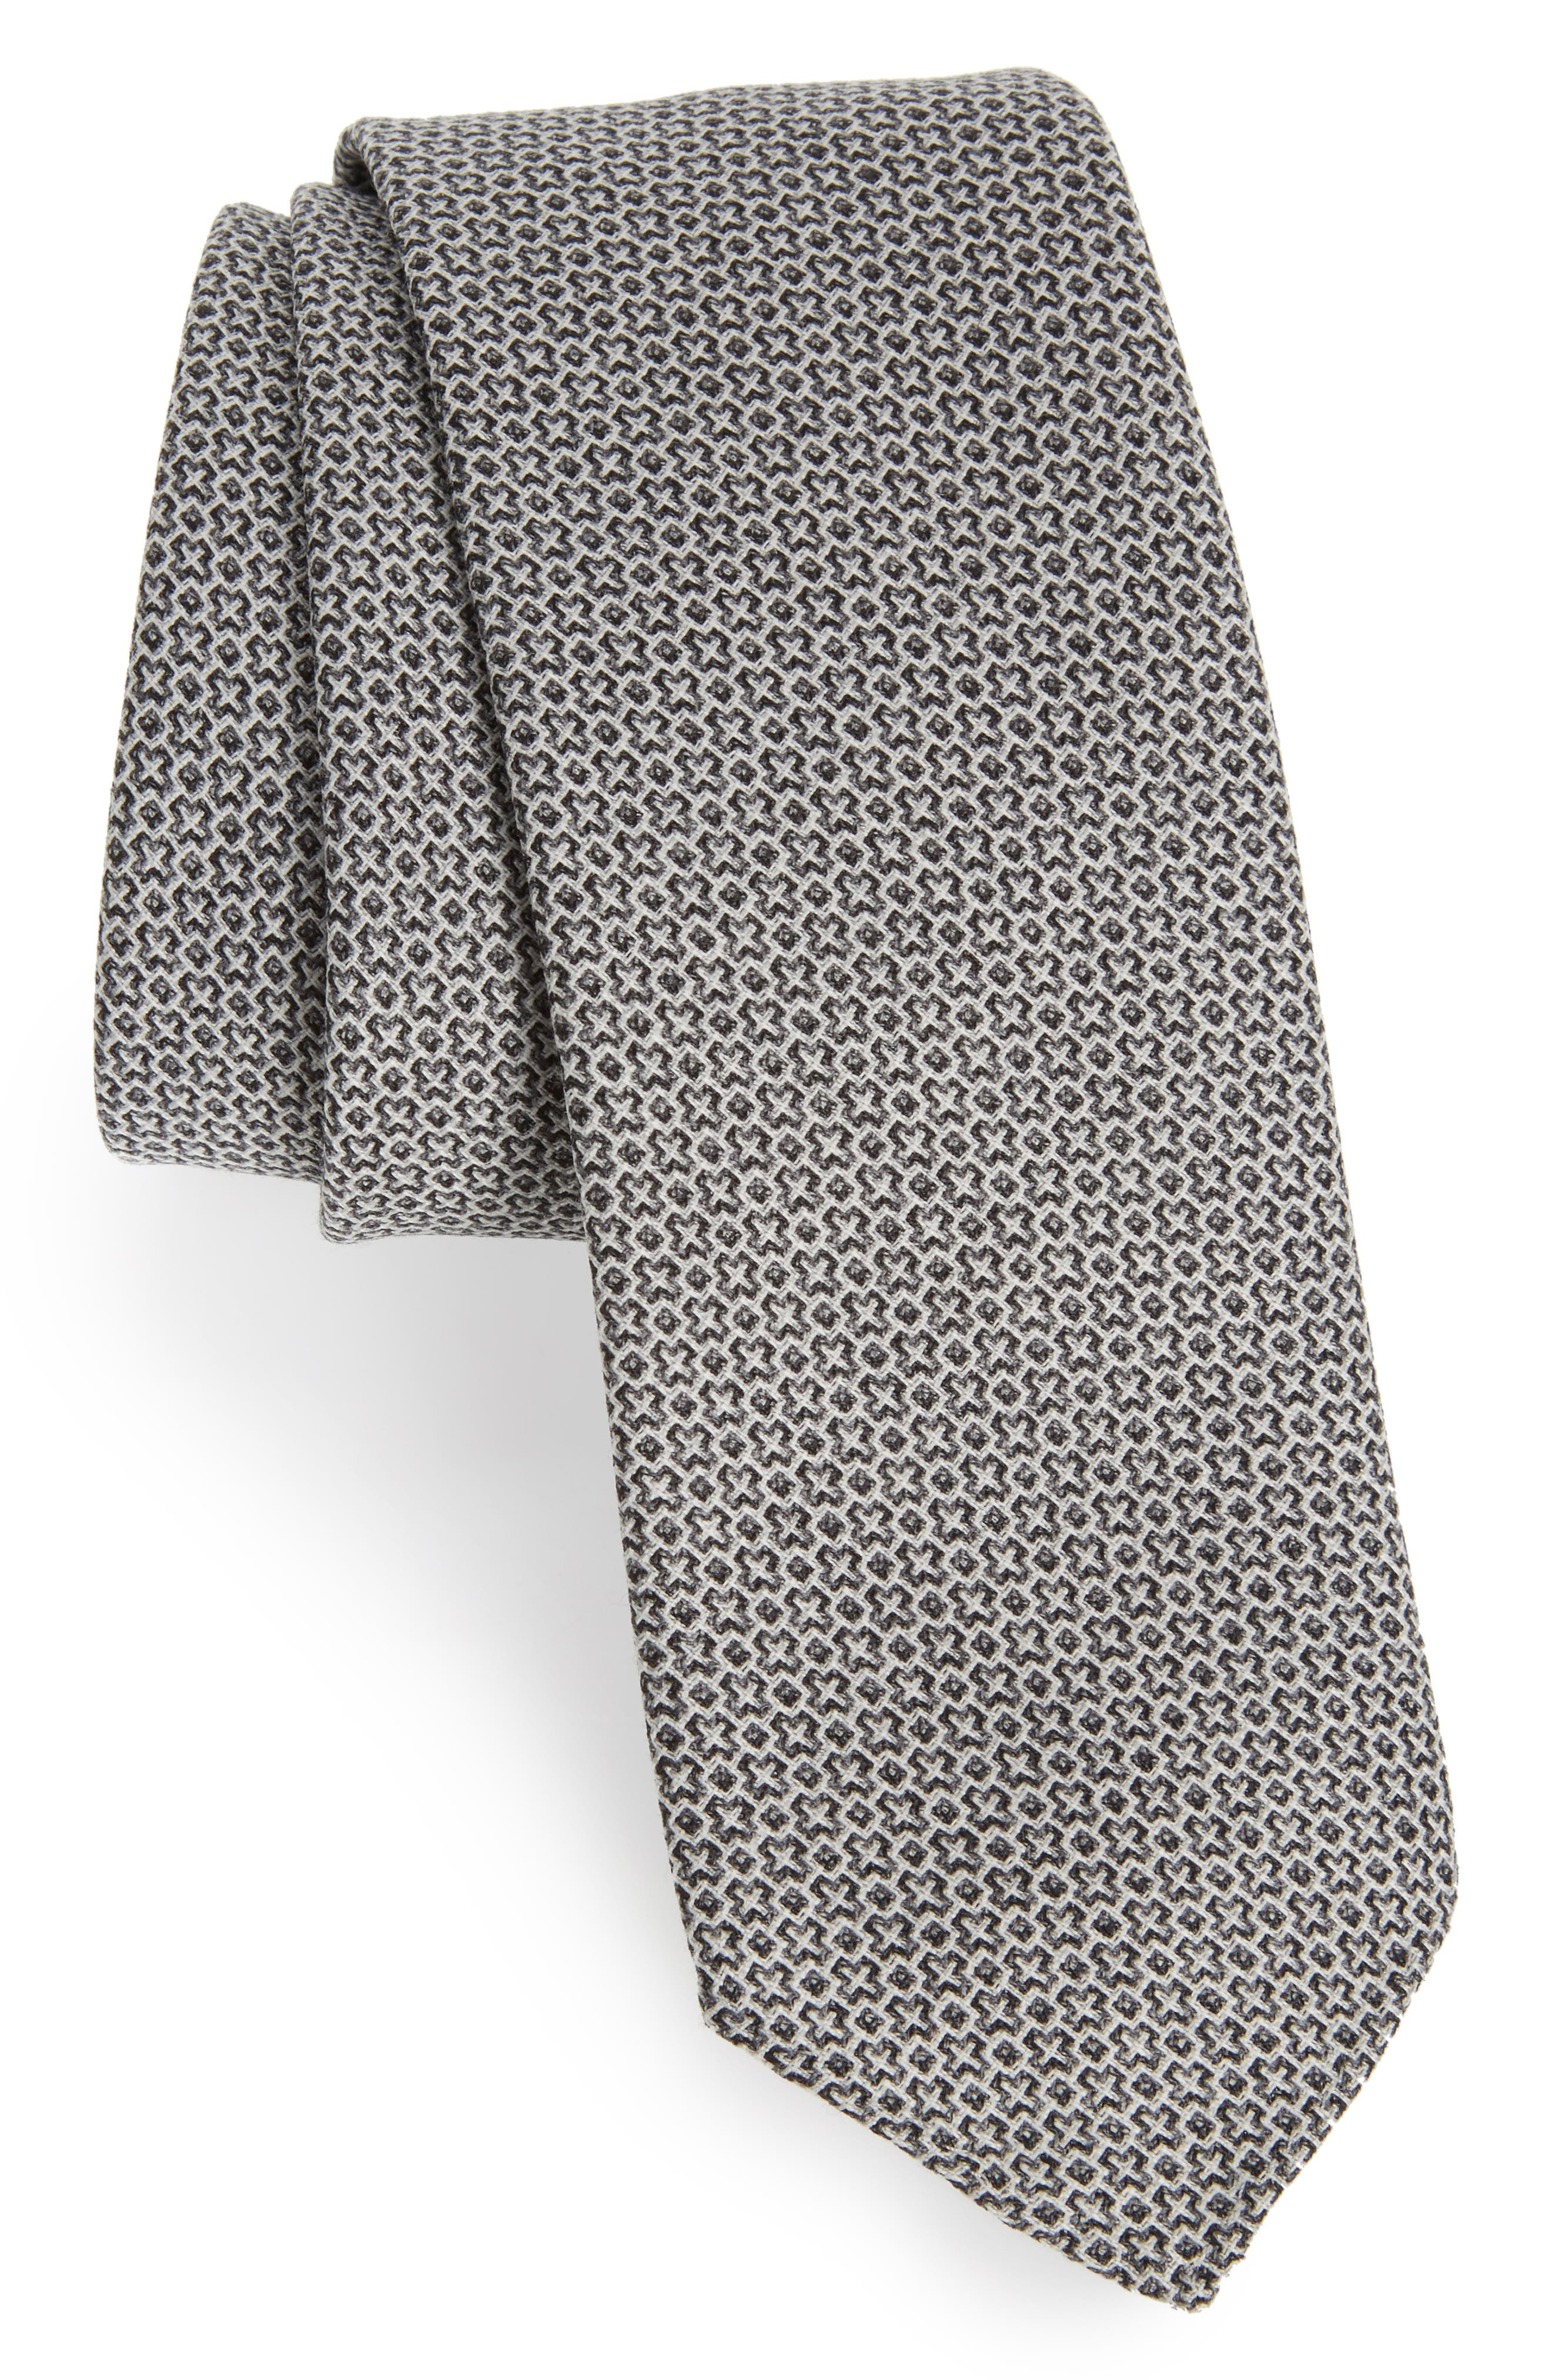 Jacquard Tie,                         Main,                         color, 030